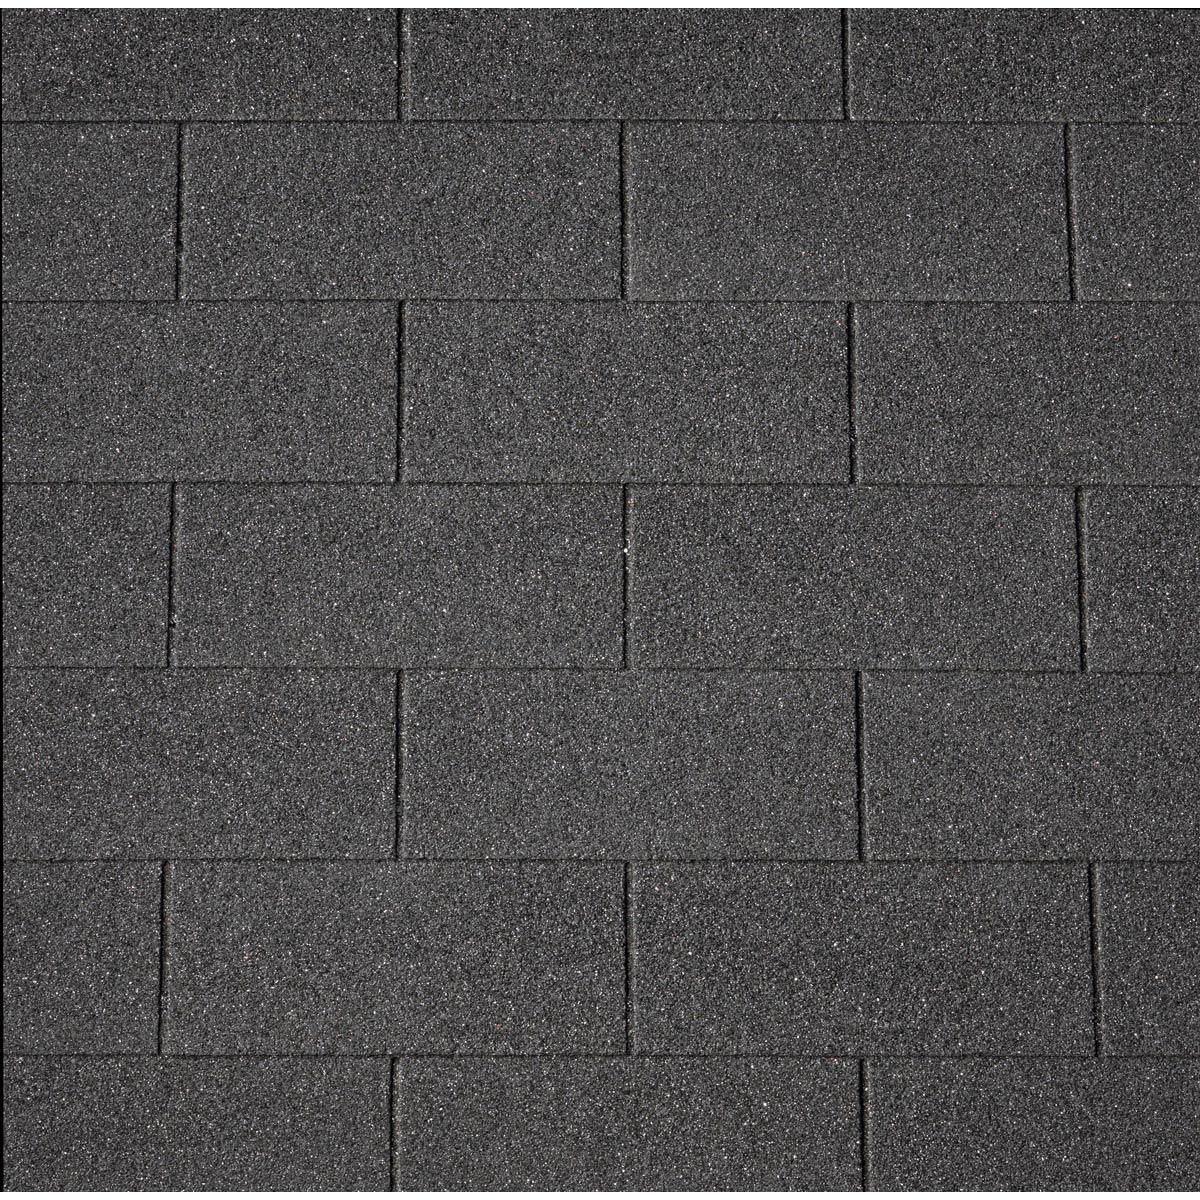 bardeau noir x 1 m top shingle leroy merlin. Black Bedroom Furniture Sets. Home Design Ideas